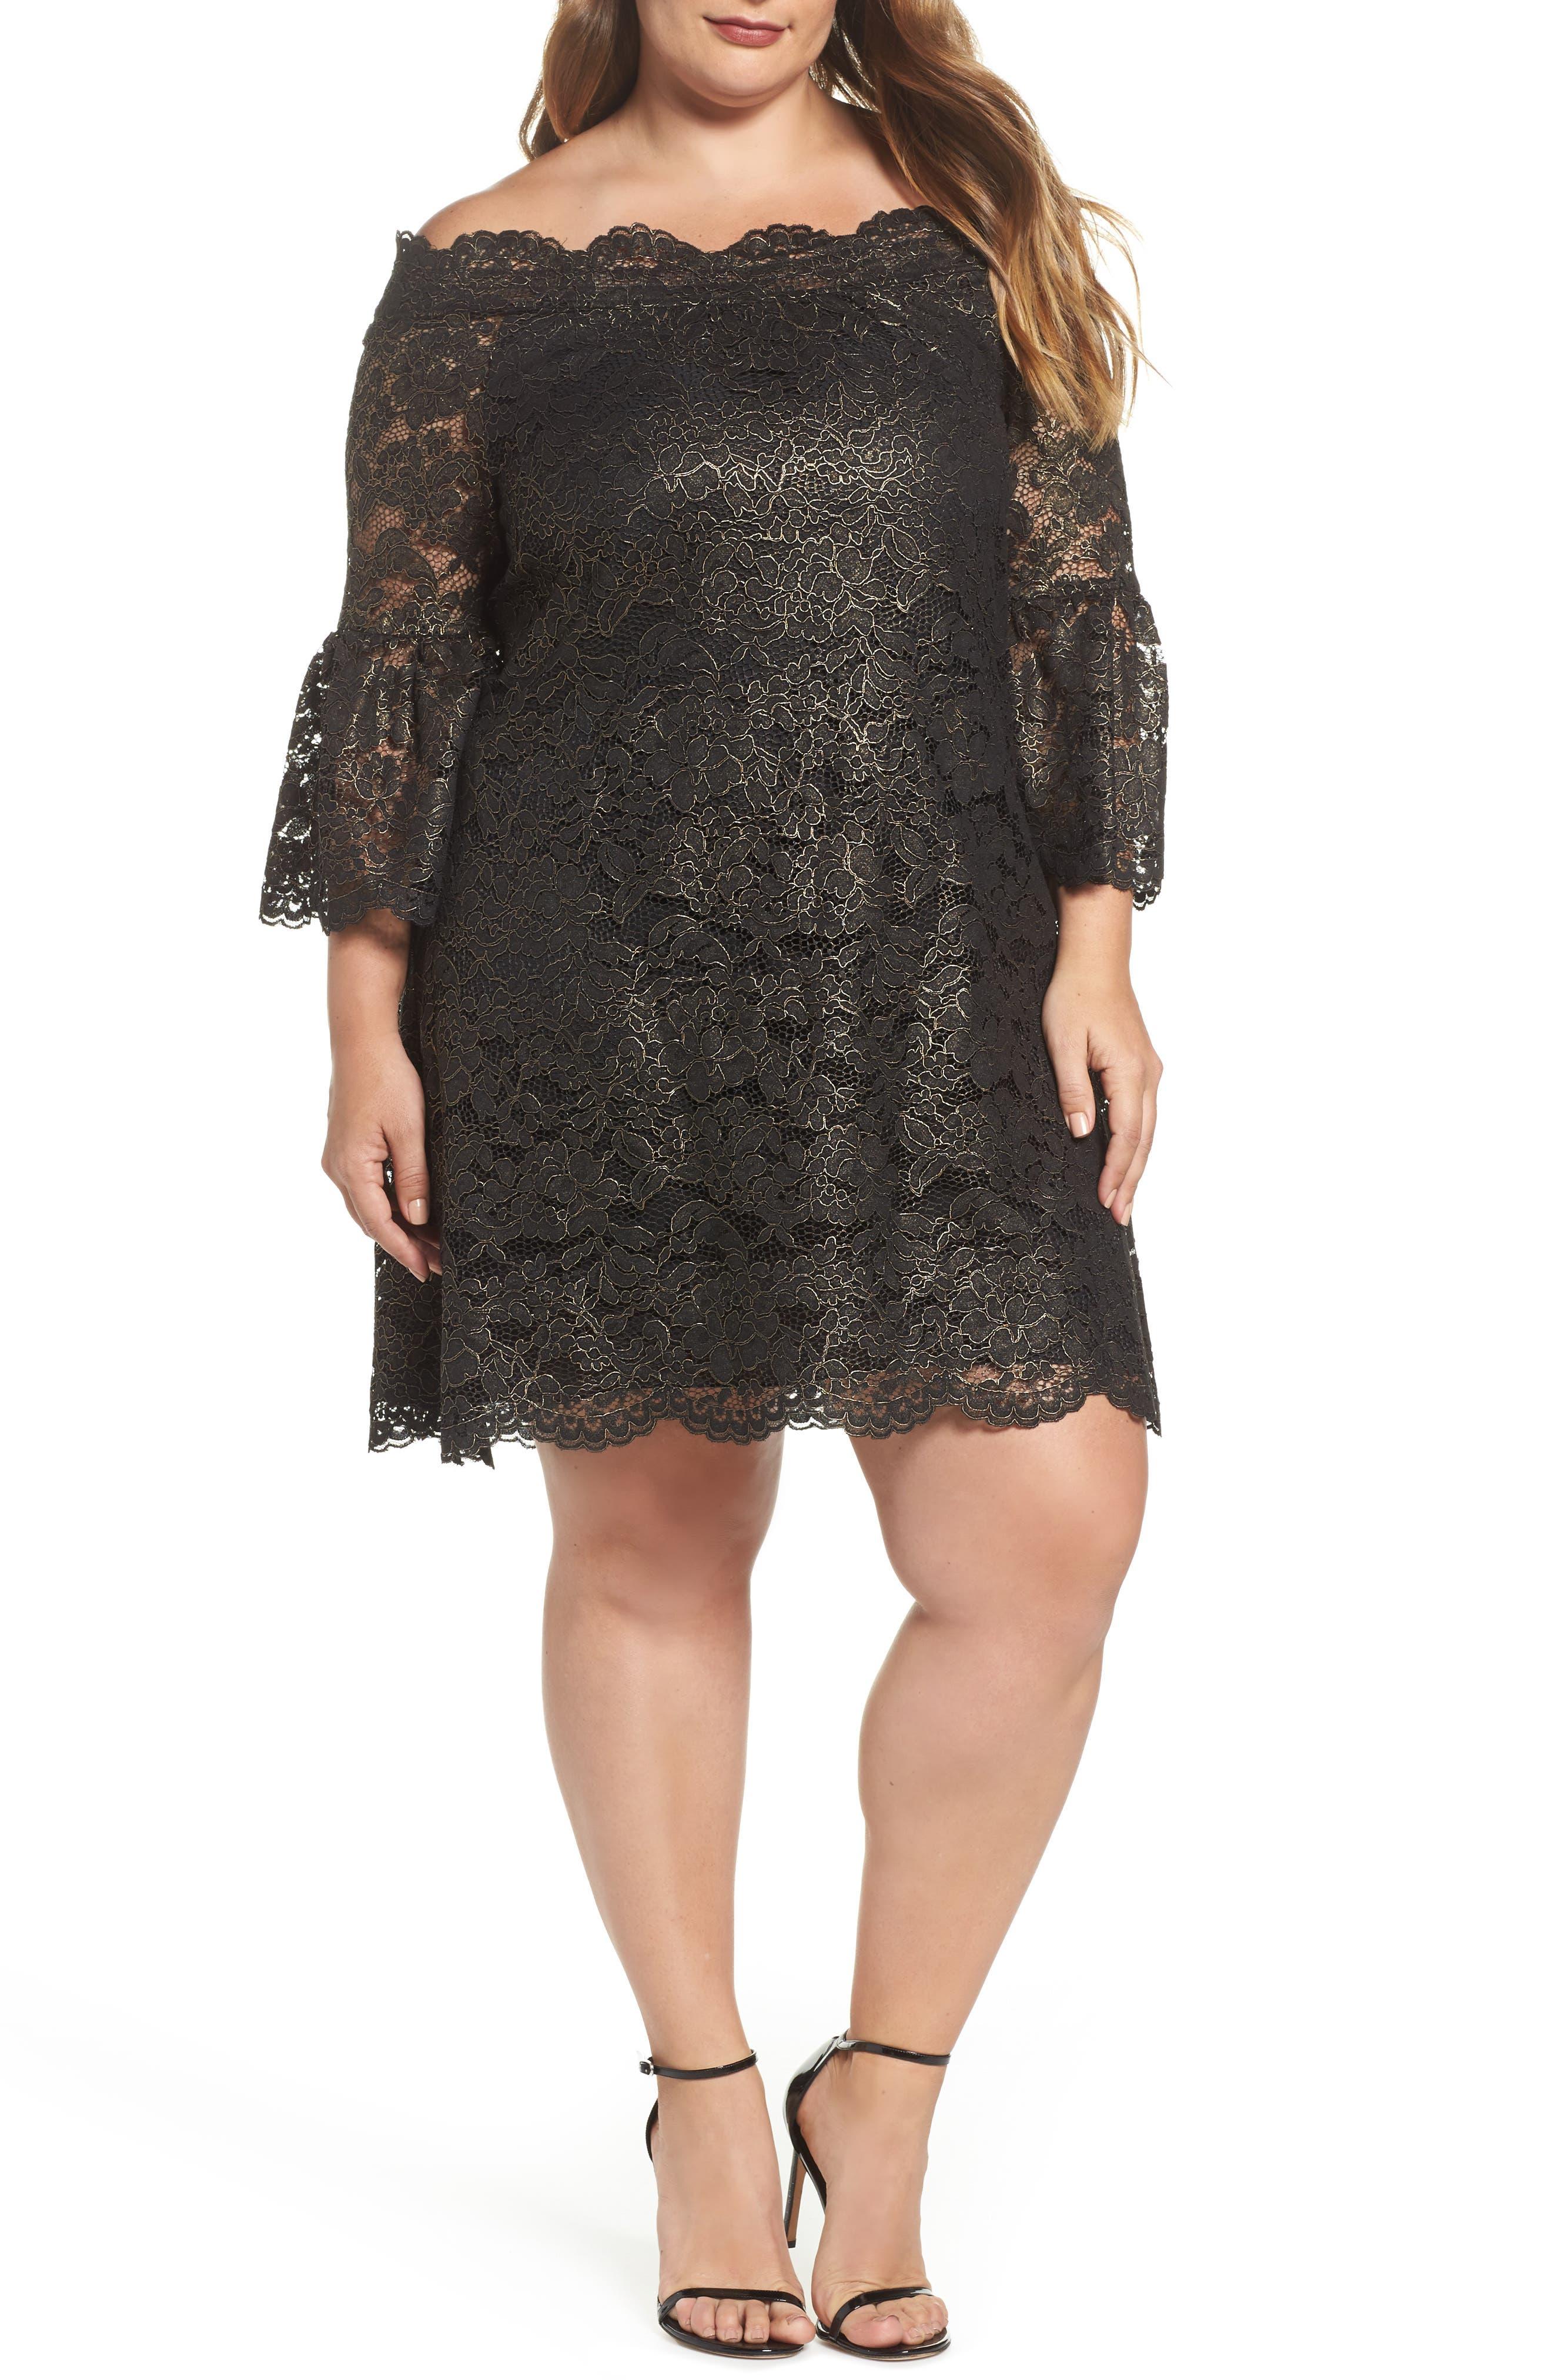 Off the Shoulder Black Gold Lace Dress,                         Main,                         color, 005